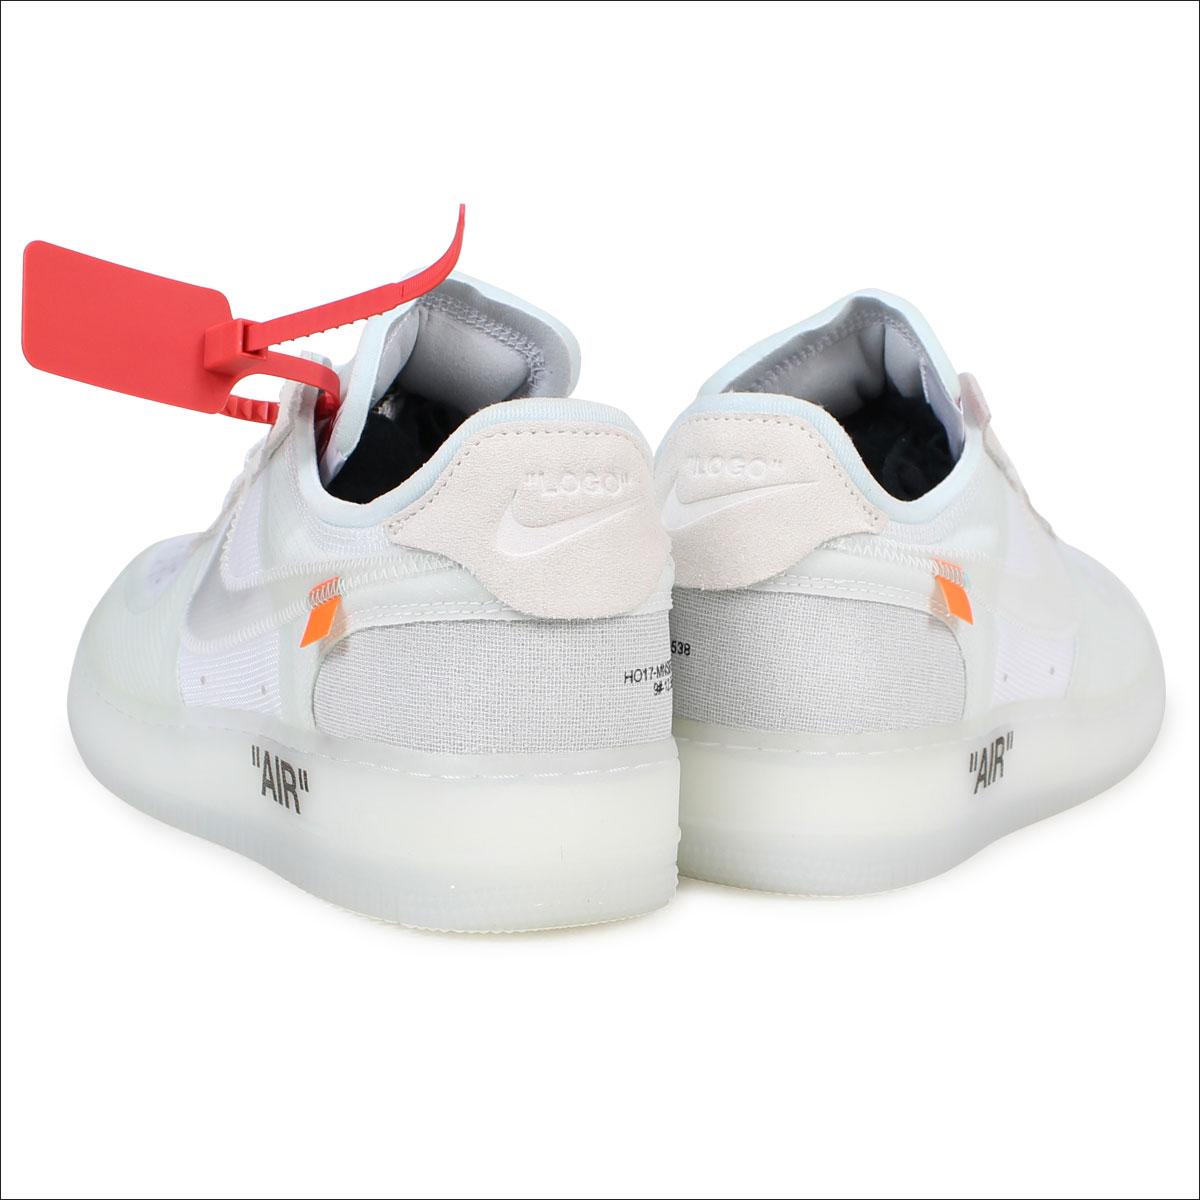 san francisco 36495 f1ca6 NIKE AIR FORCE 1 LOW VIRGIL ABLOH THE TEN Nike OFF-WHITE air force 1  sneakers AO4606-100 men white